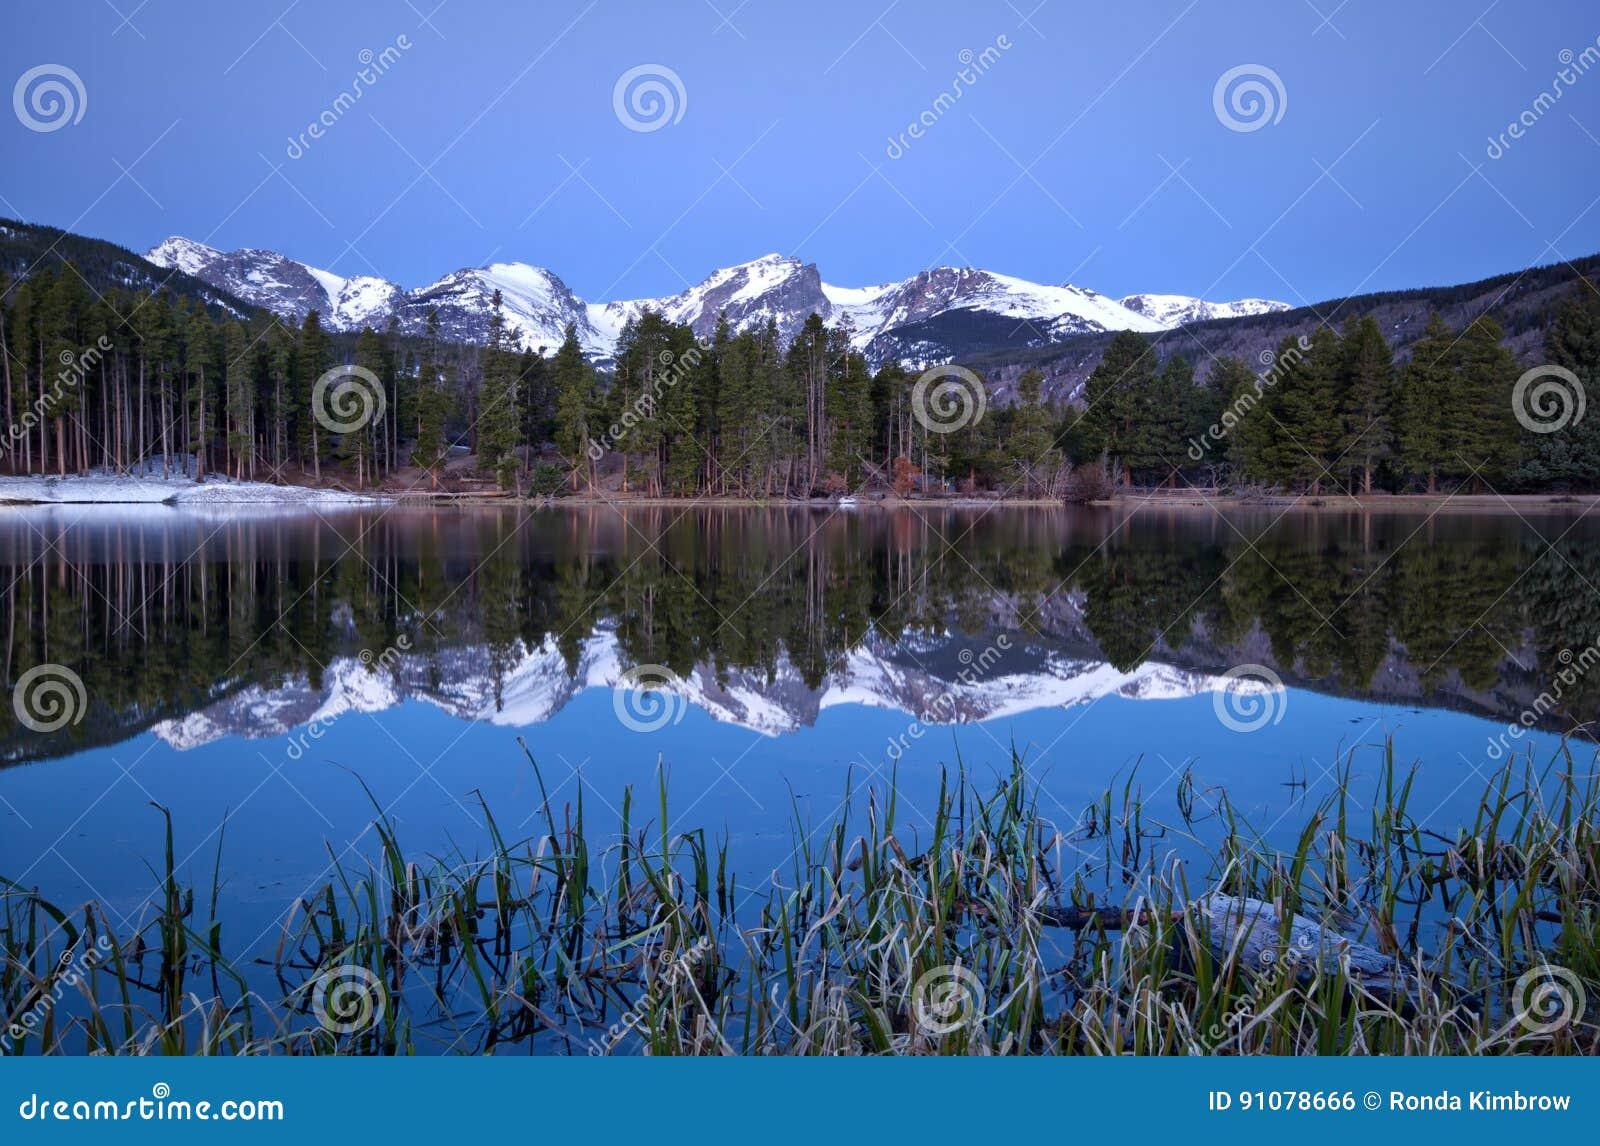 Gry Pre bilden av den kontinentala skiljelinjen och en Sprague Lake refl